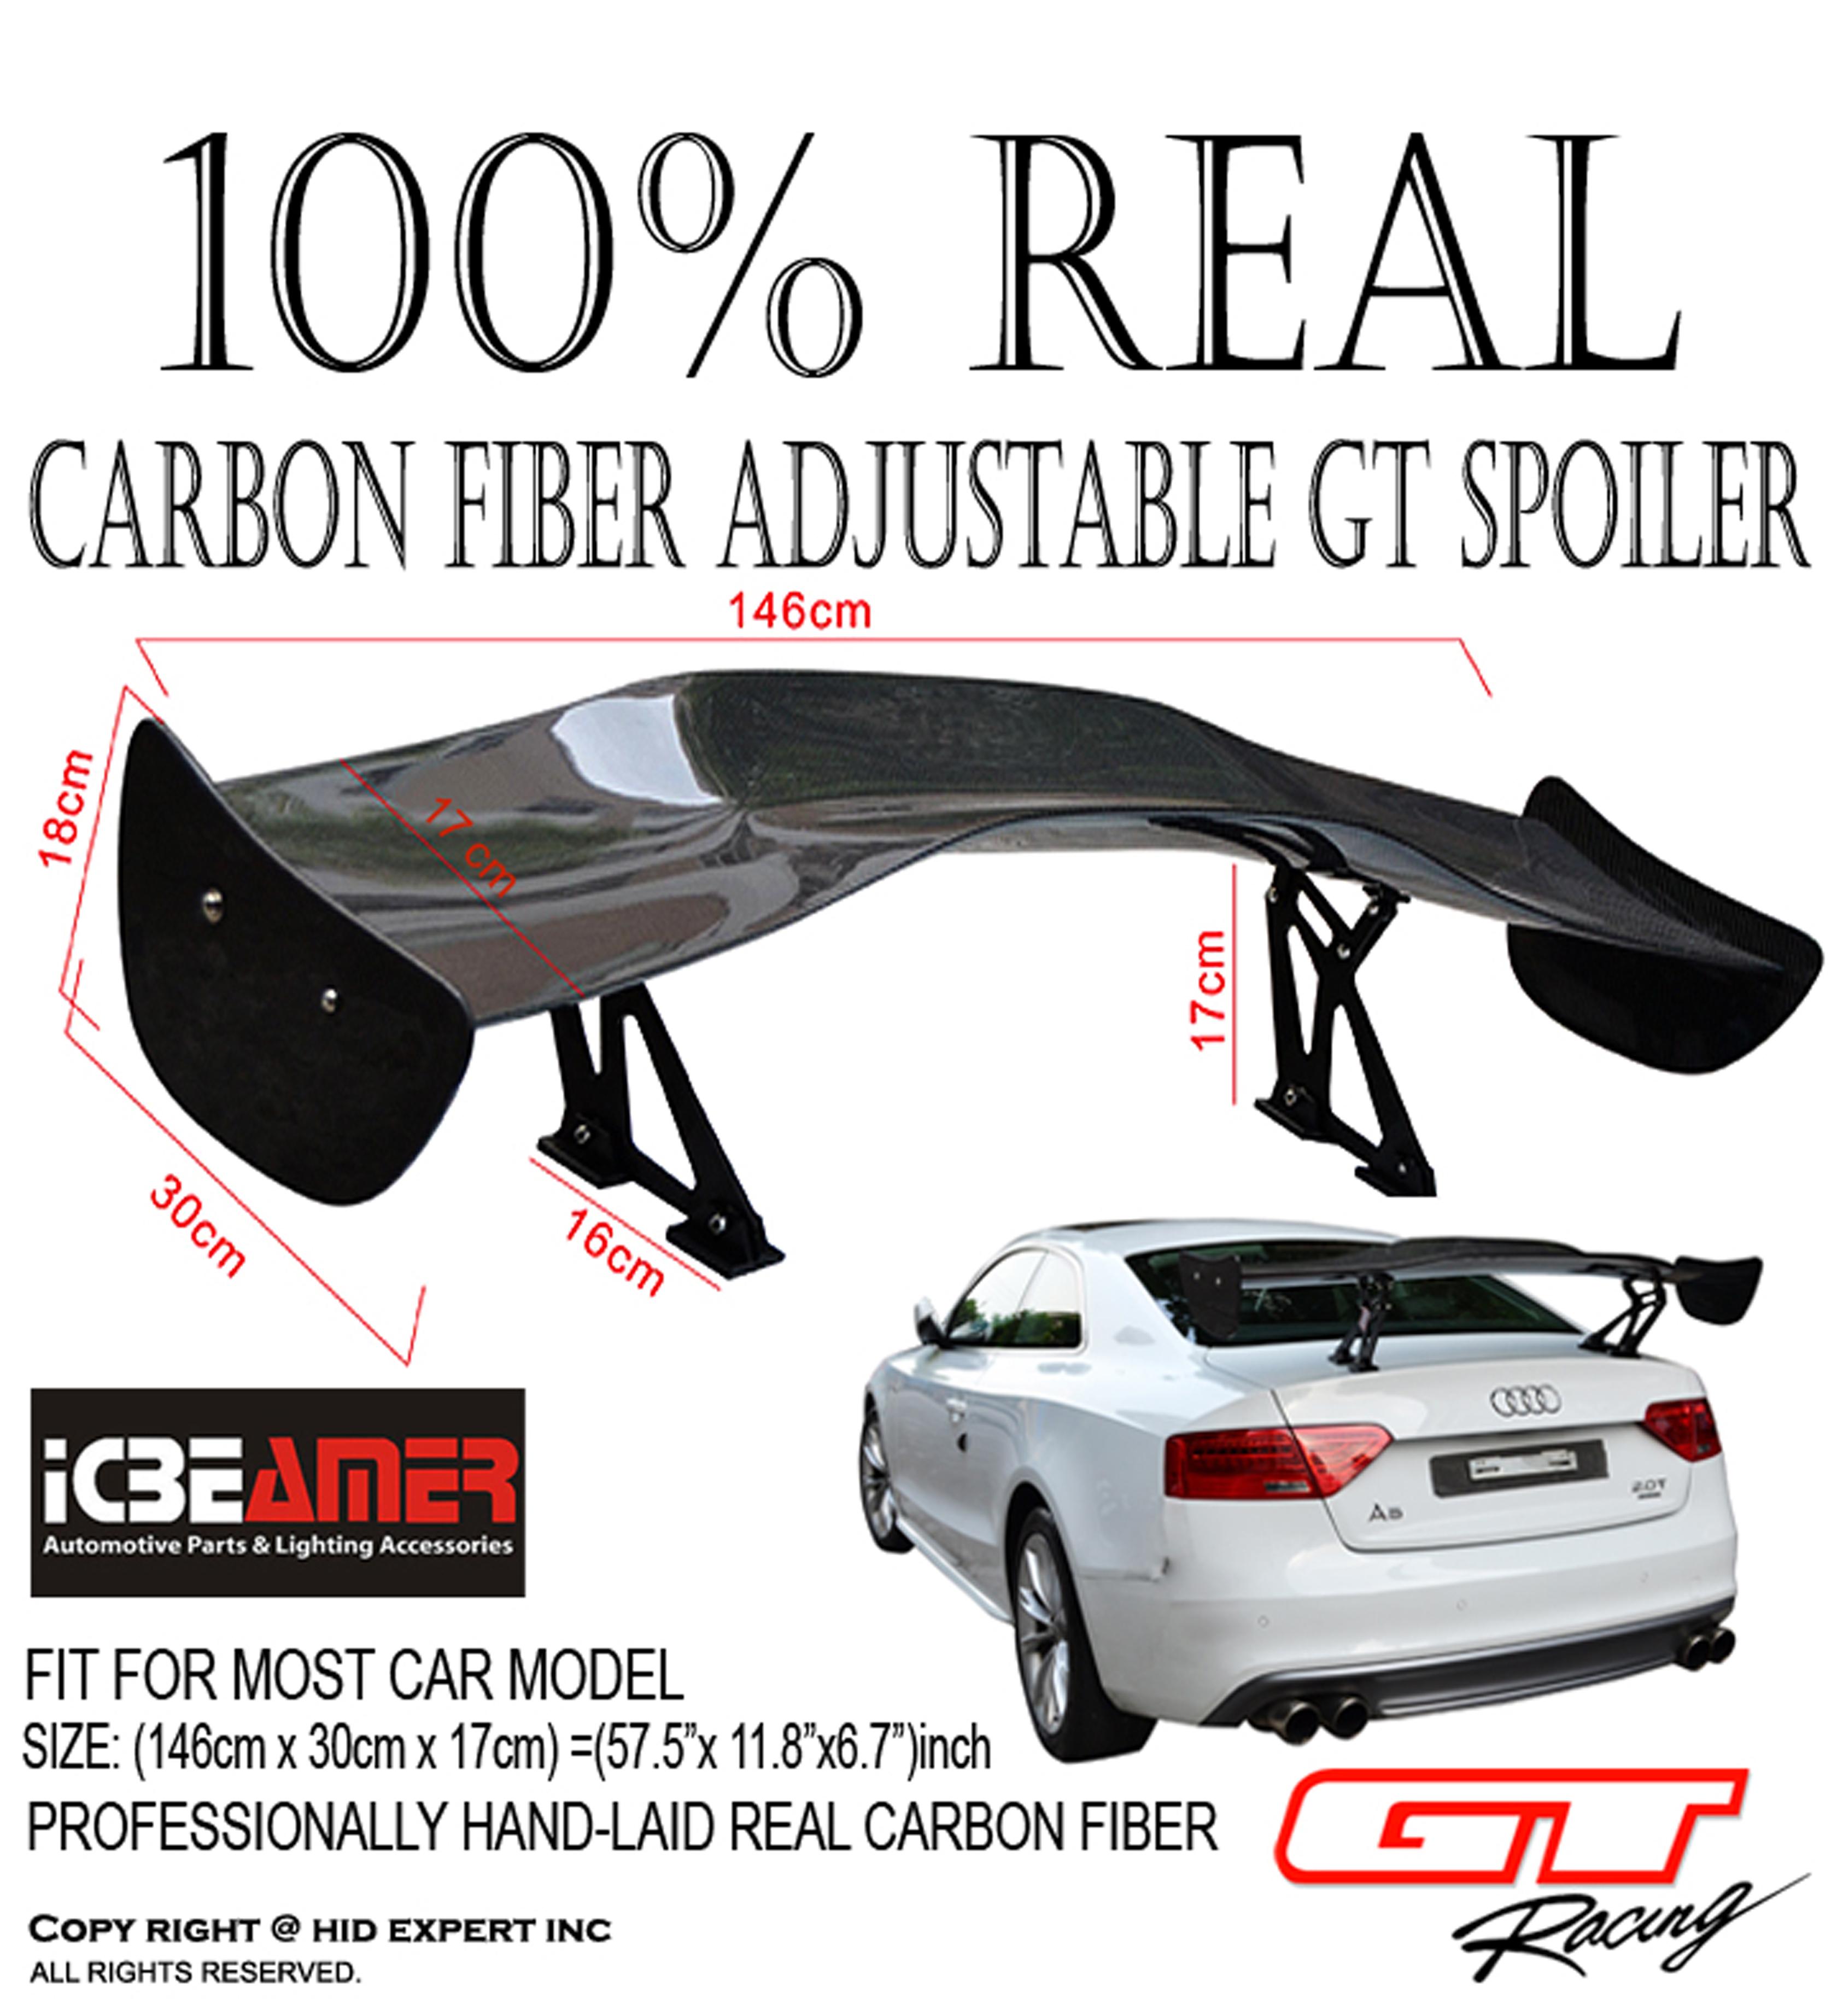 cad691171c44 JDM CARBON FIBER GT STYLE 58 inch RACING REAR BACK TRUNK SPOILER WING -  ICBEAMER